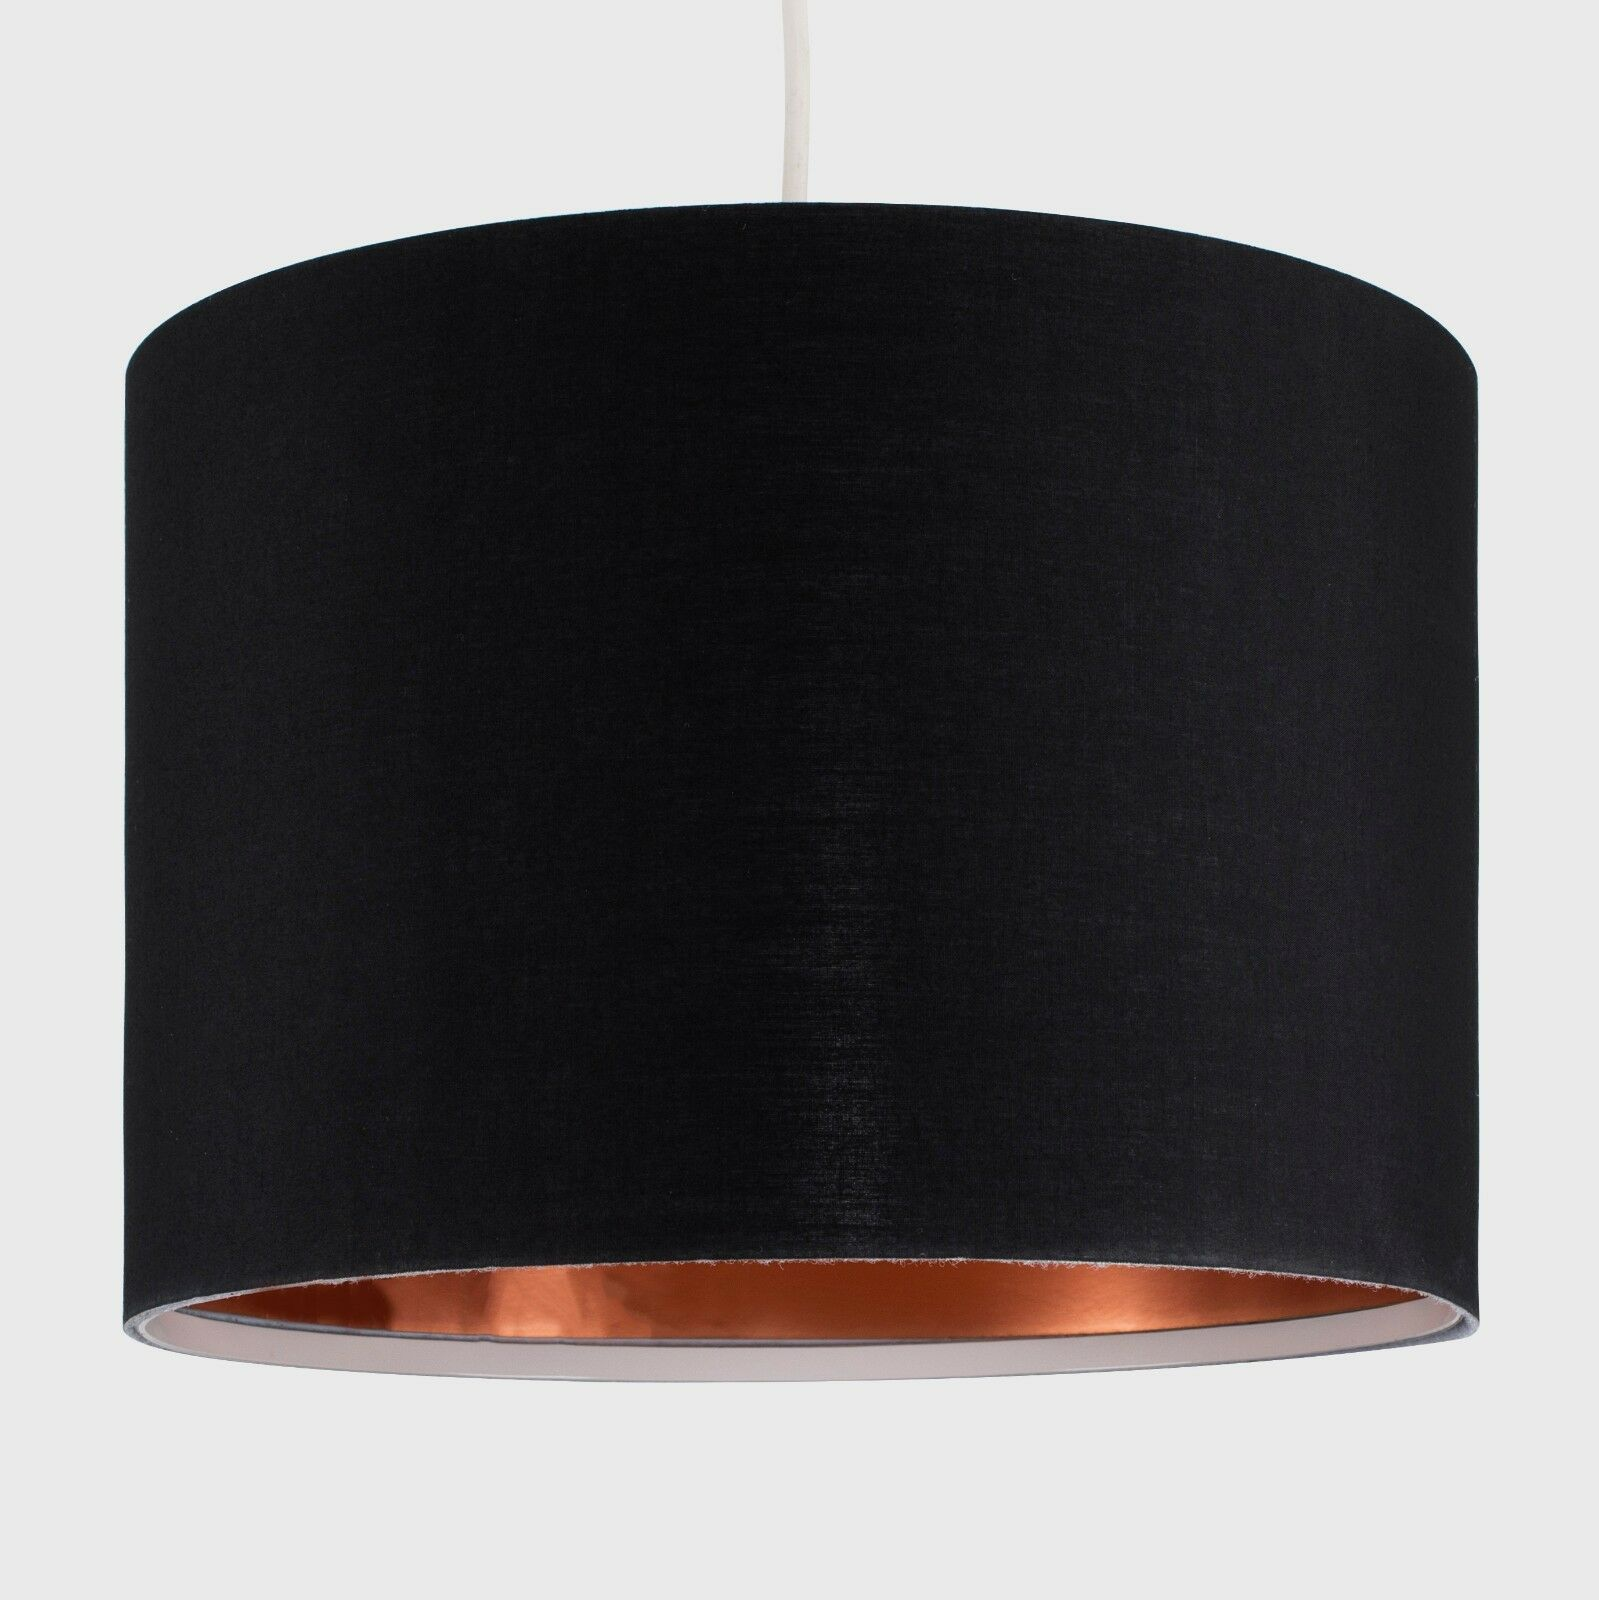 Tela-moderna-algodon-facil-ajuste-Techo-Colgante-Pantalla-De-Mesa-tonos-de-luz-de-tambor miniatura 33